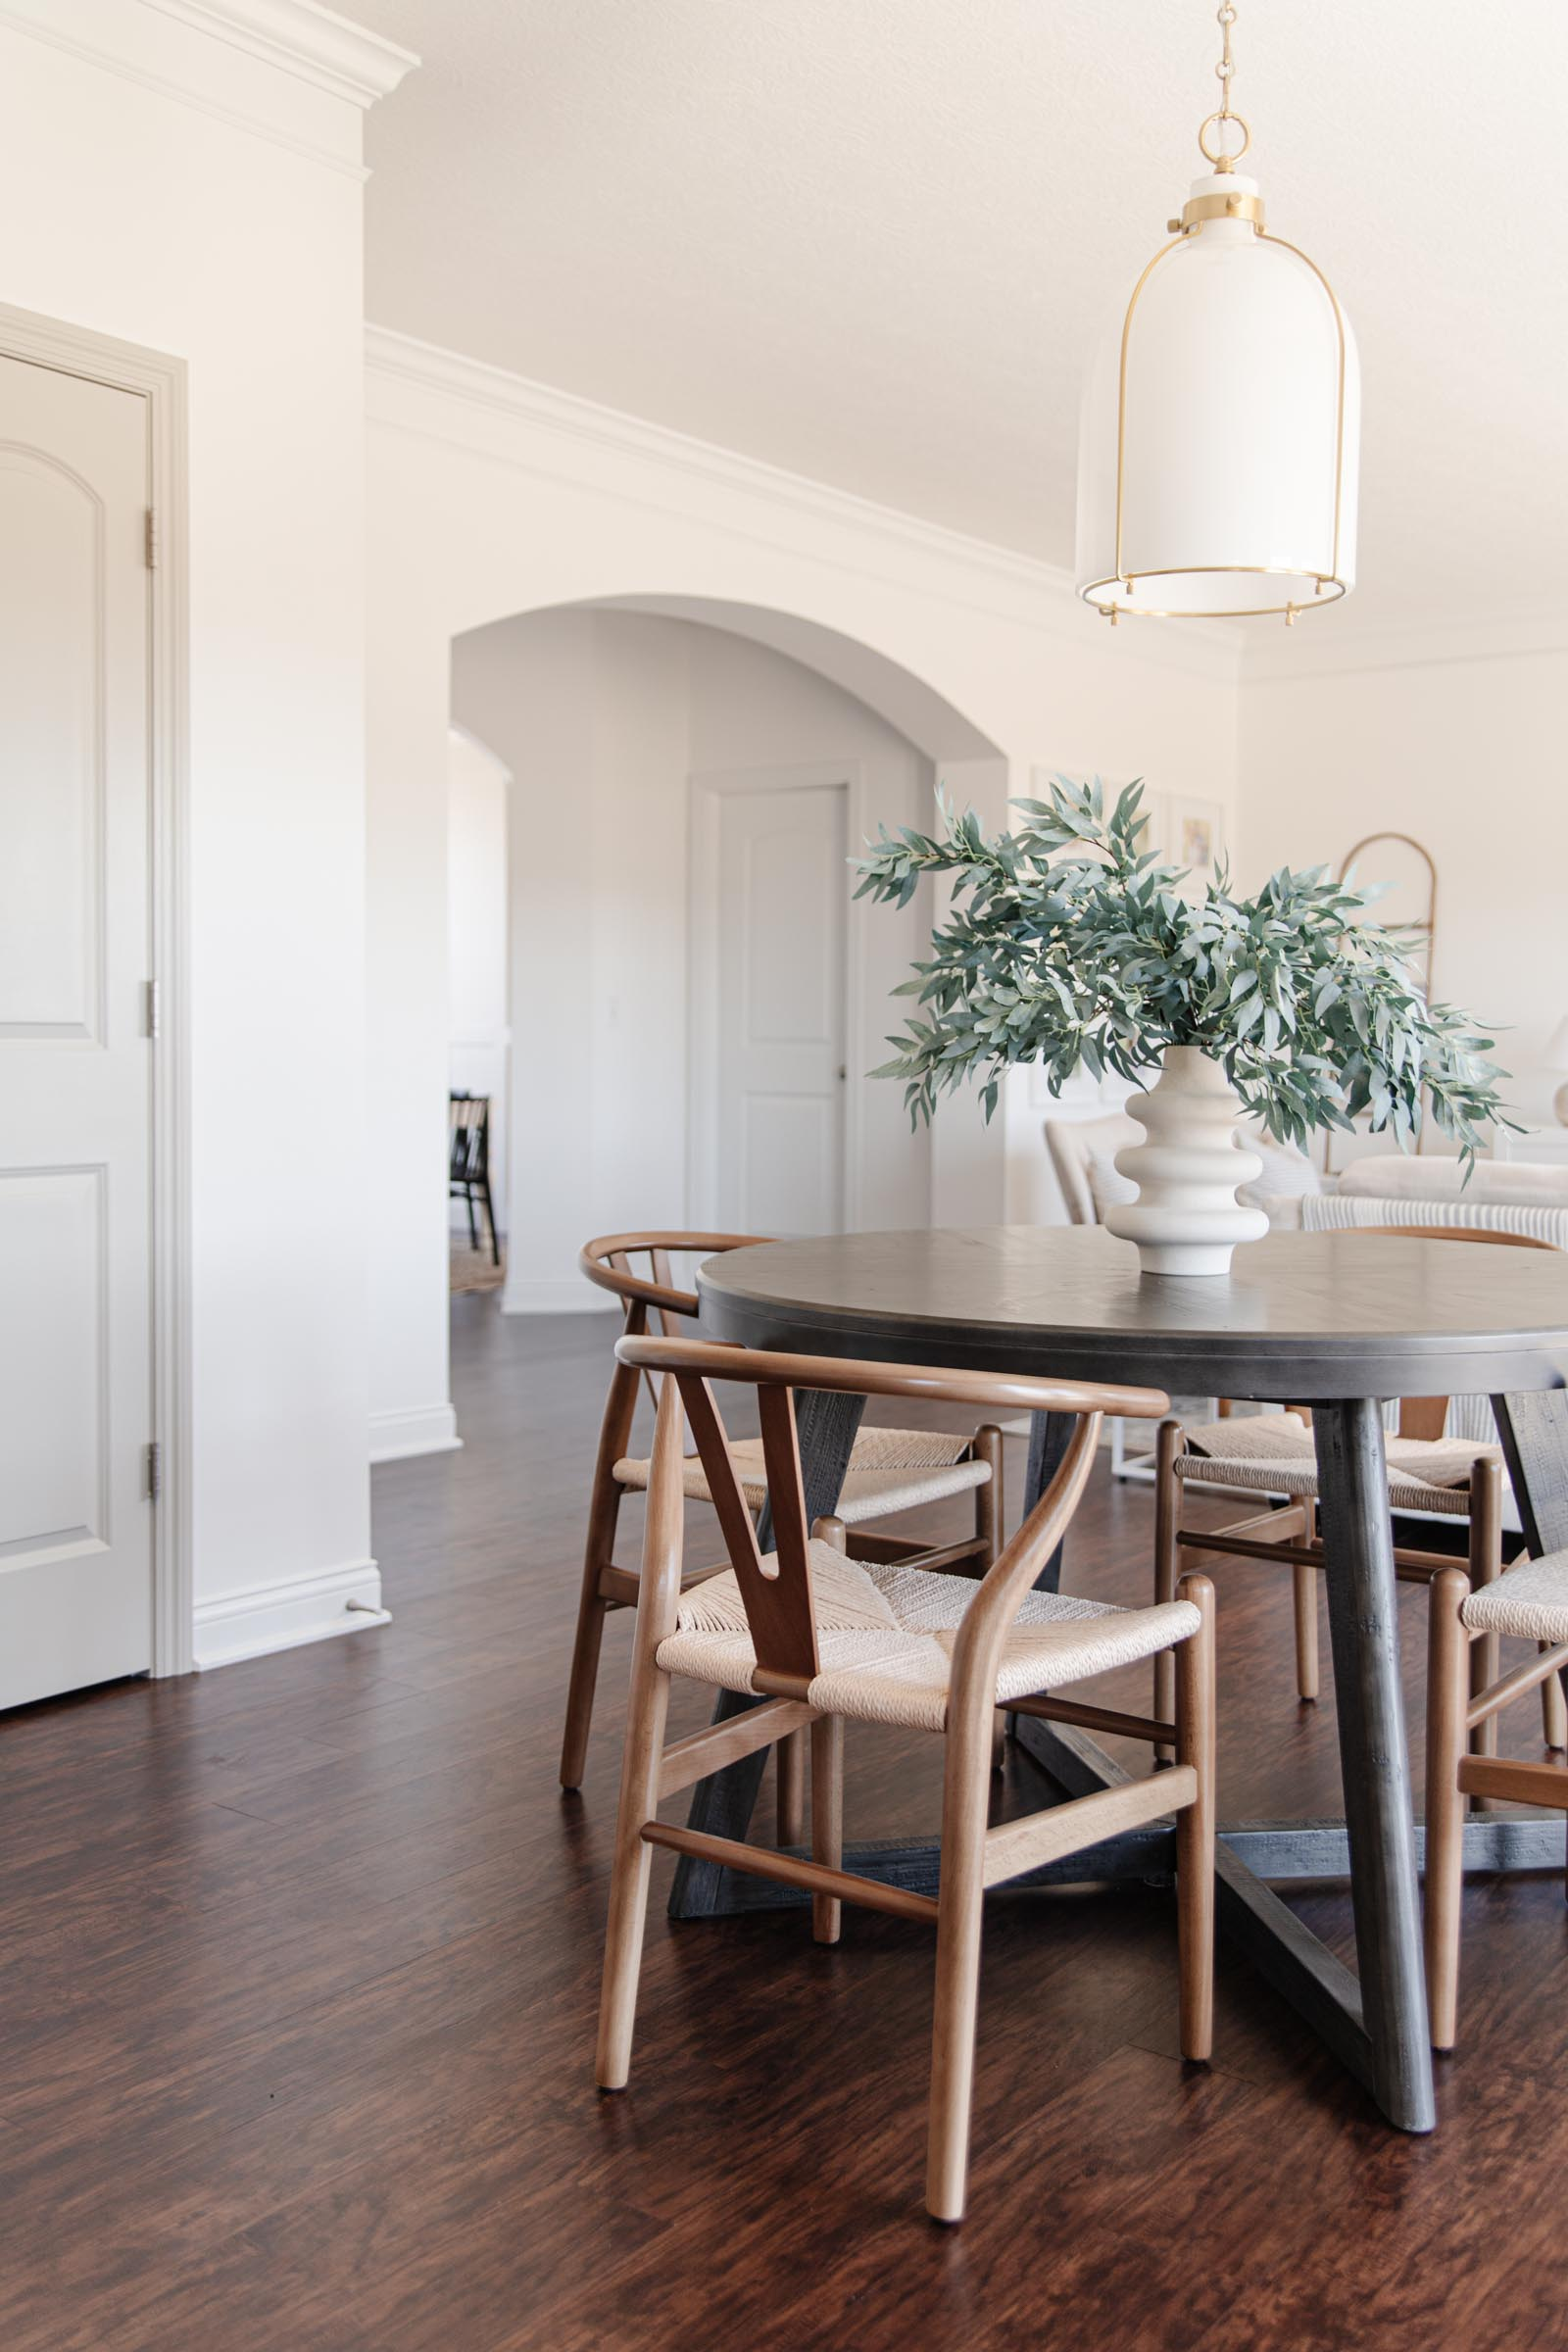 round breakfast table, wishbone chairs, brass pendant light, faux greenery